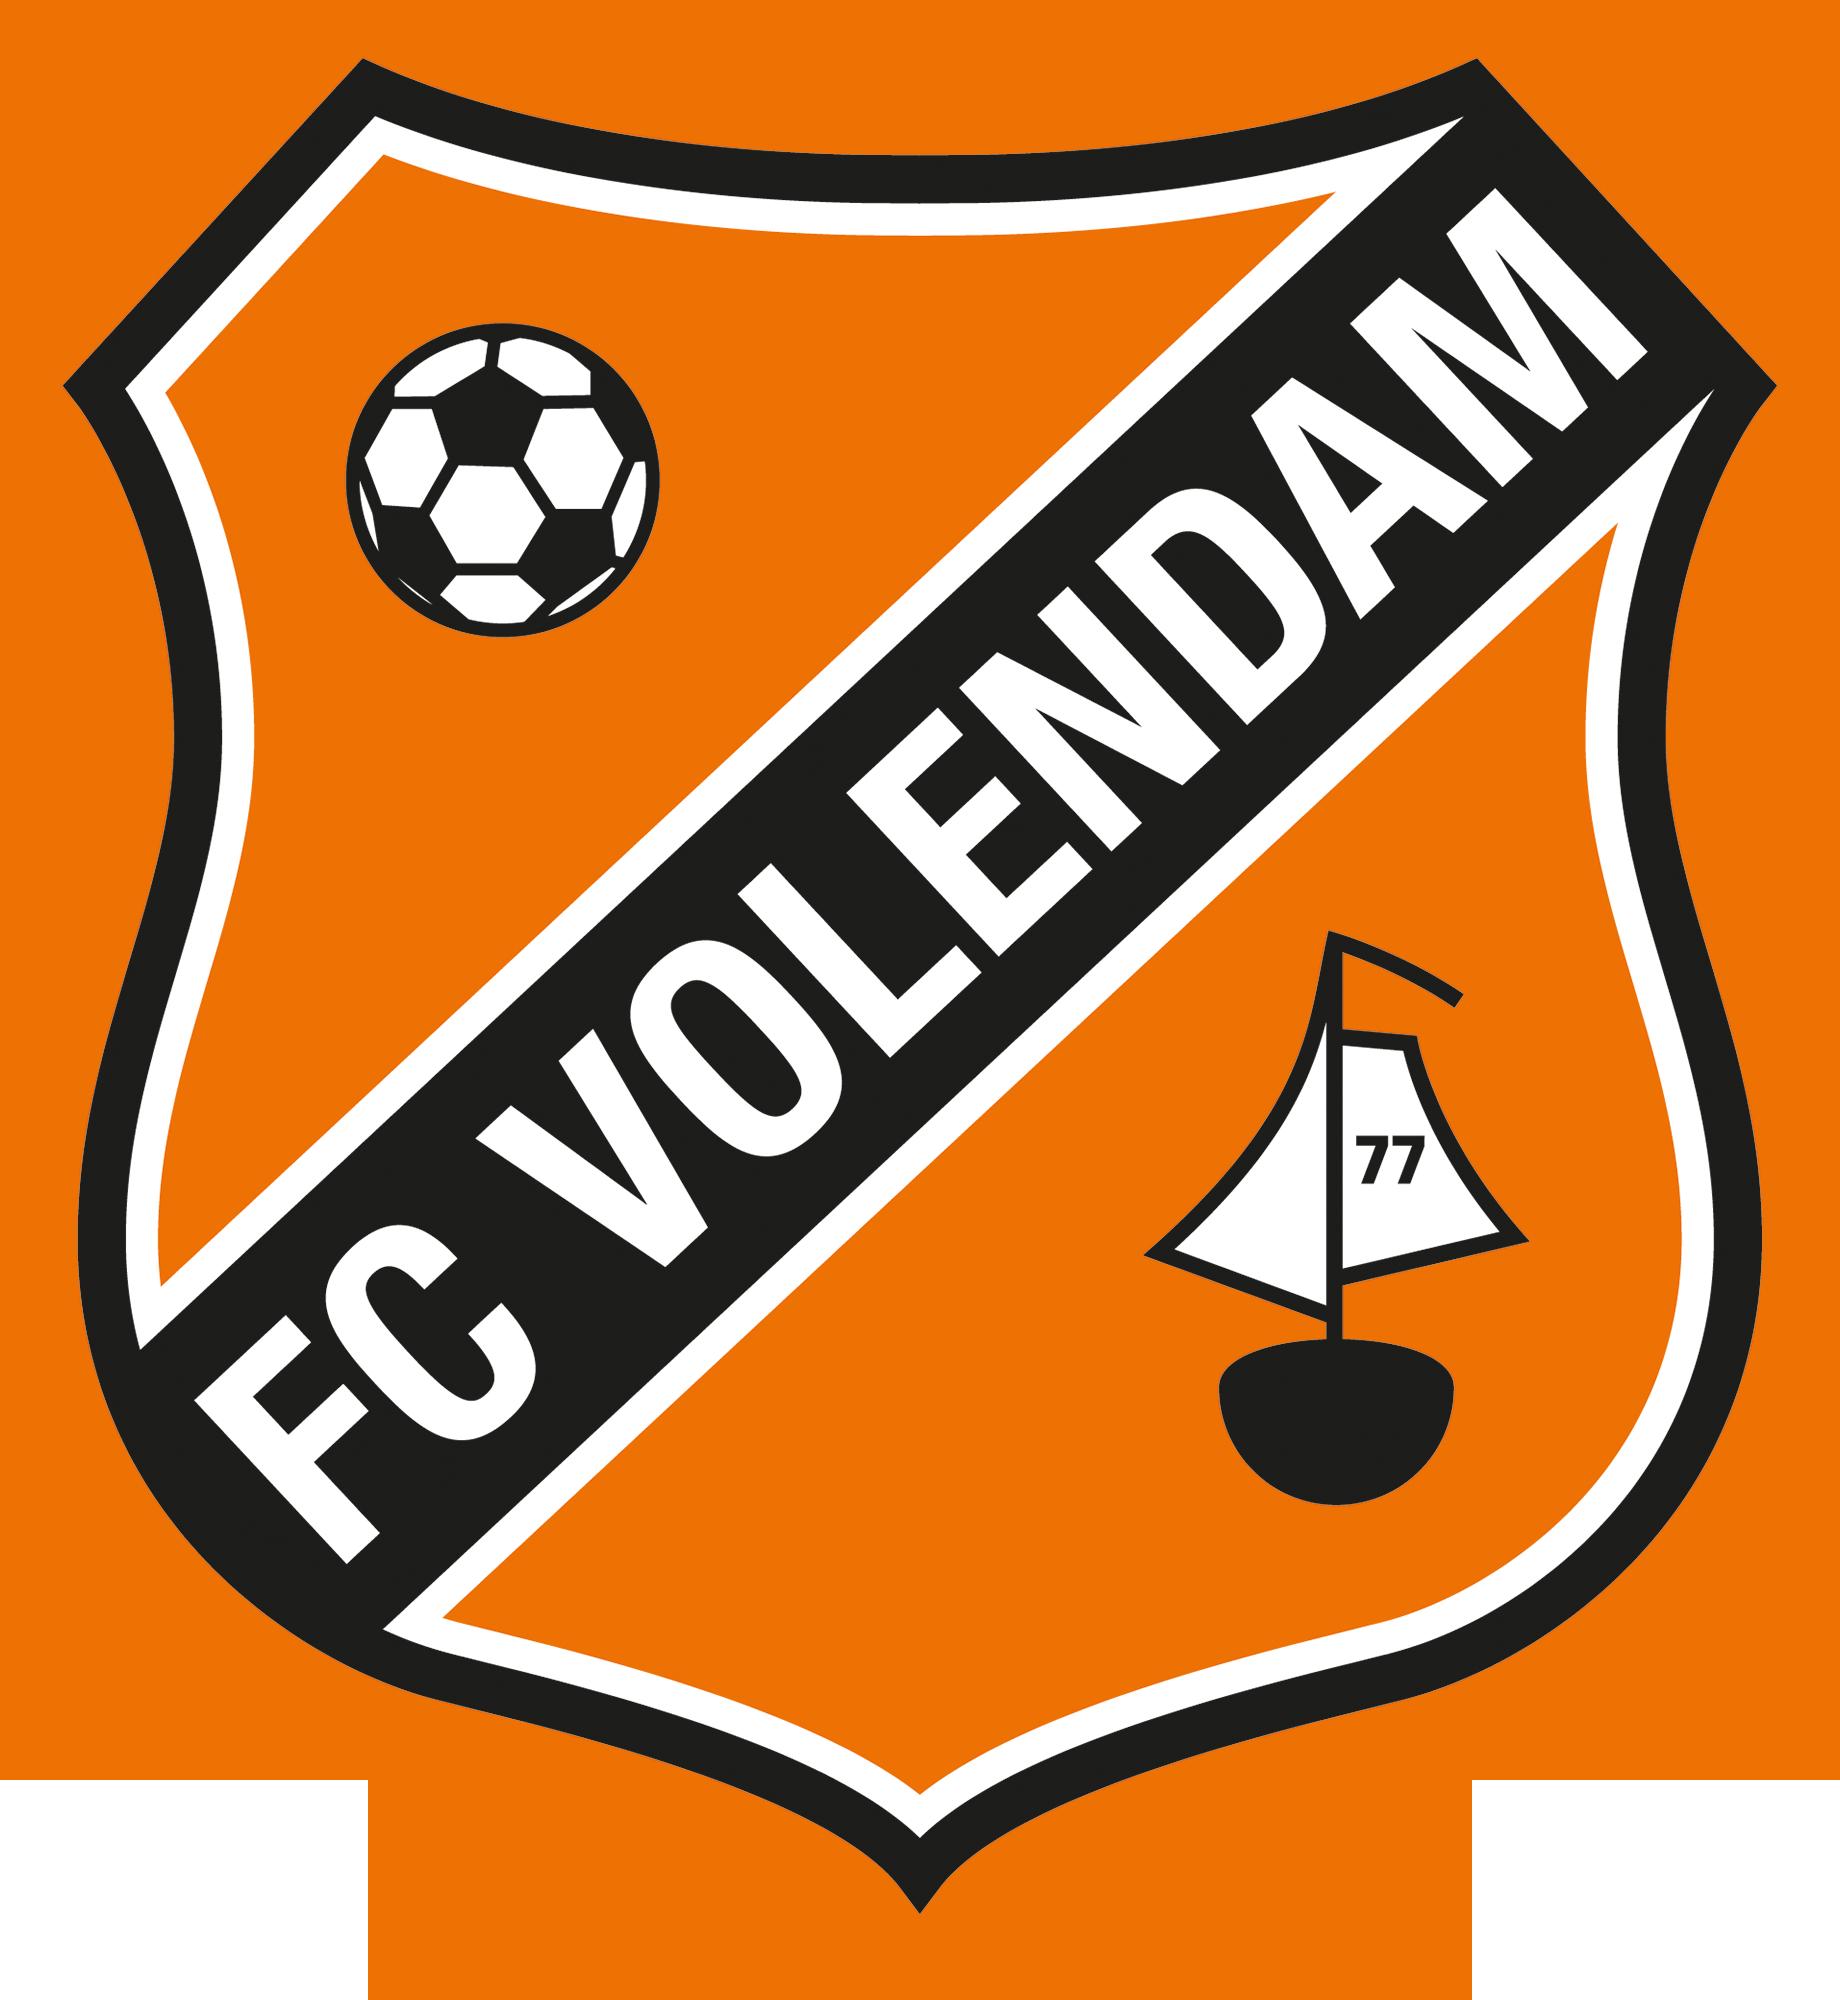 logo_fc_volendam_png